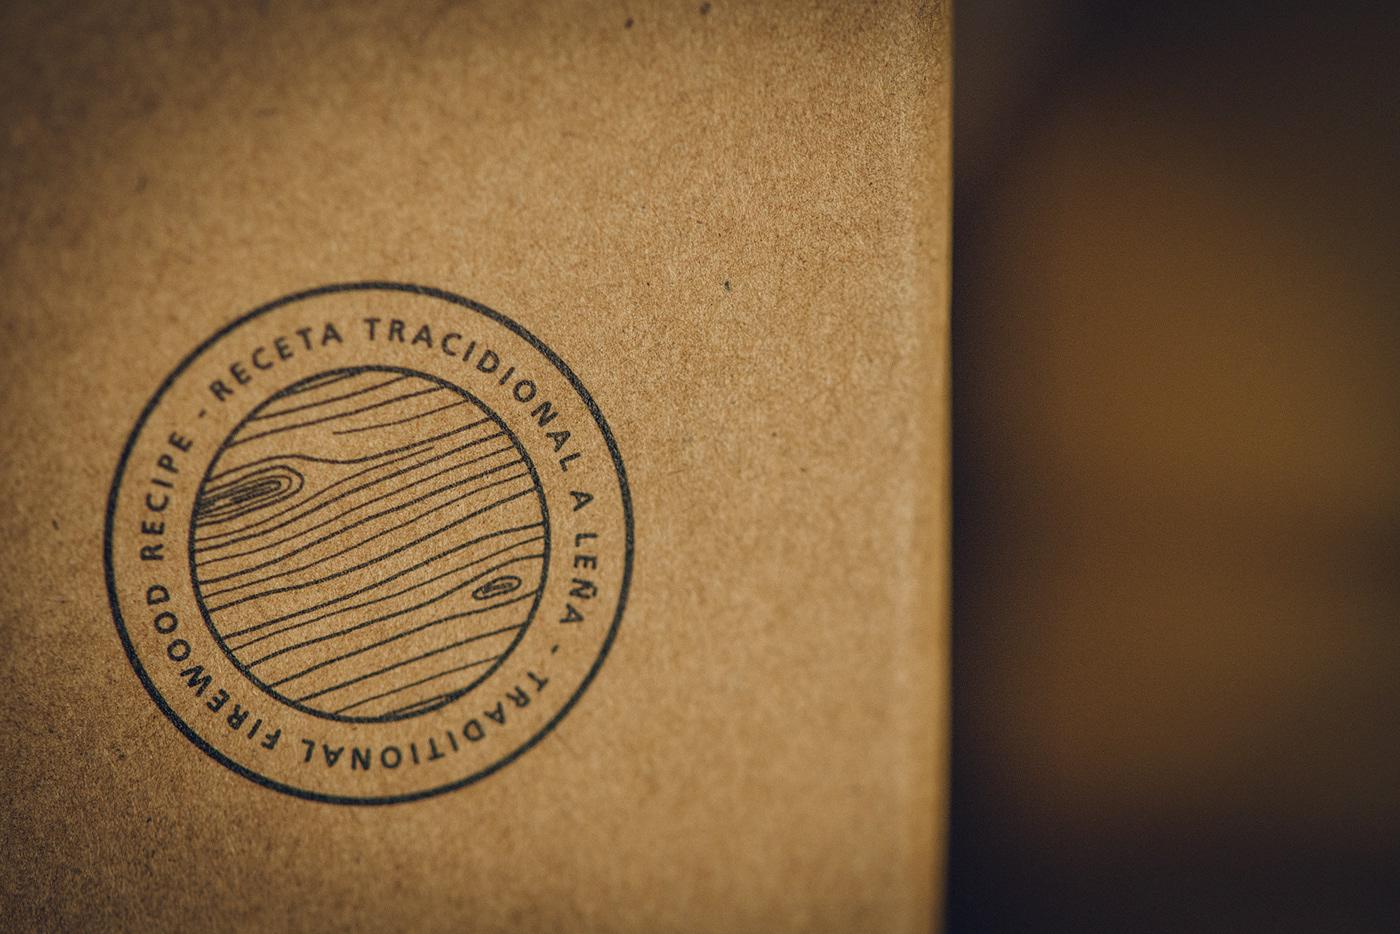 brandsummit el paeller fire Packaging paella Rice spain valencia